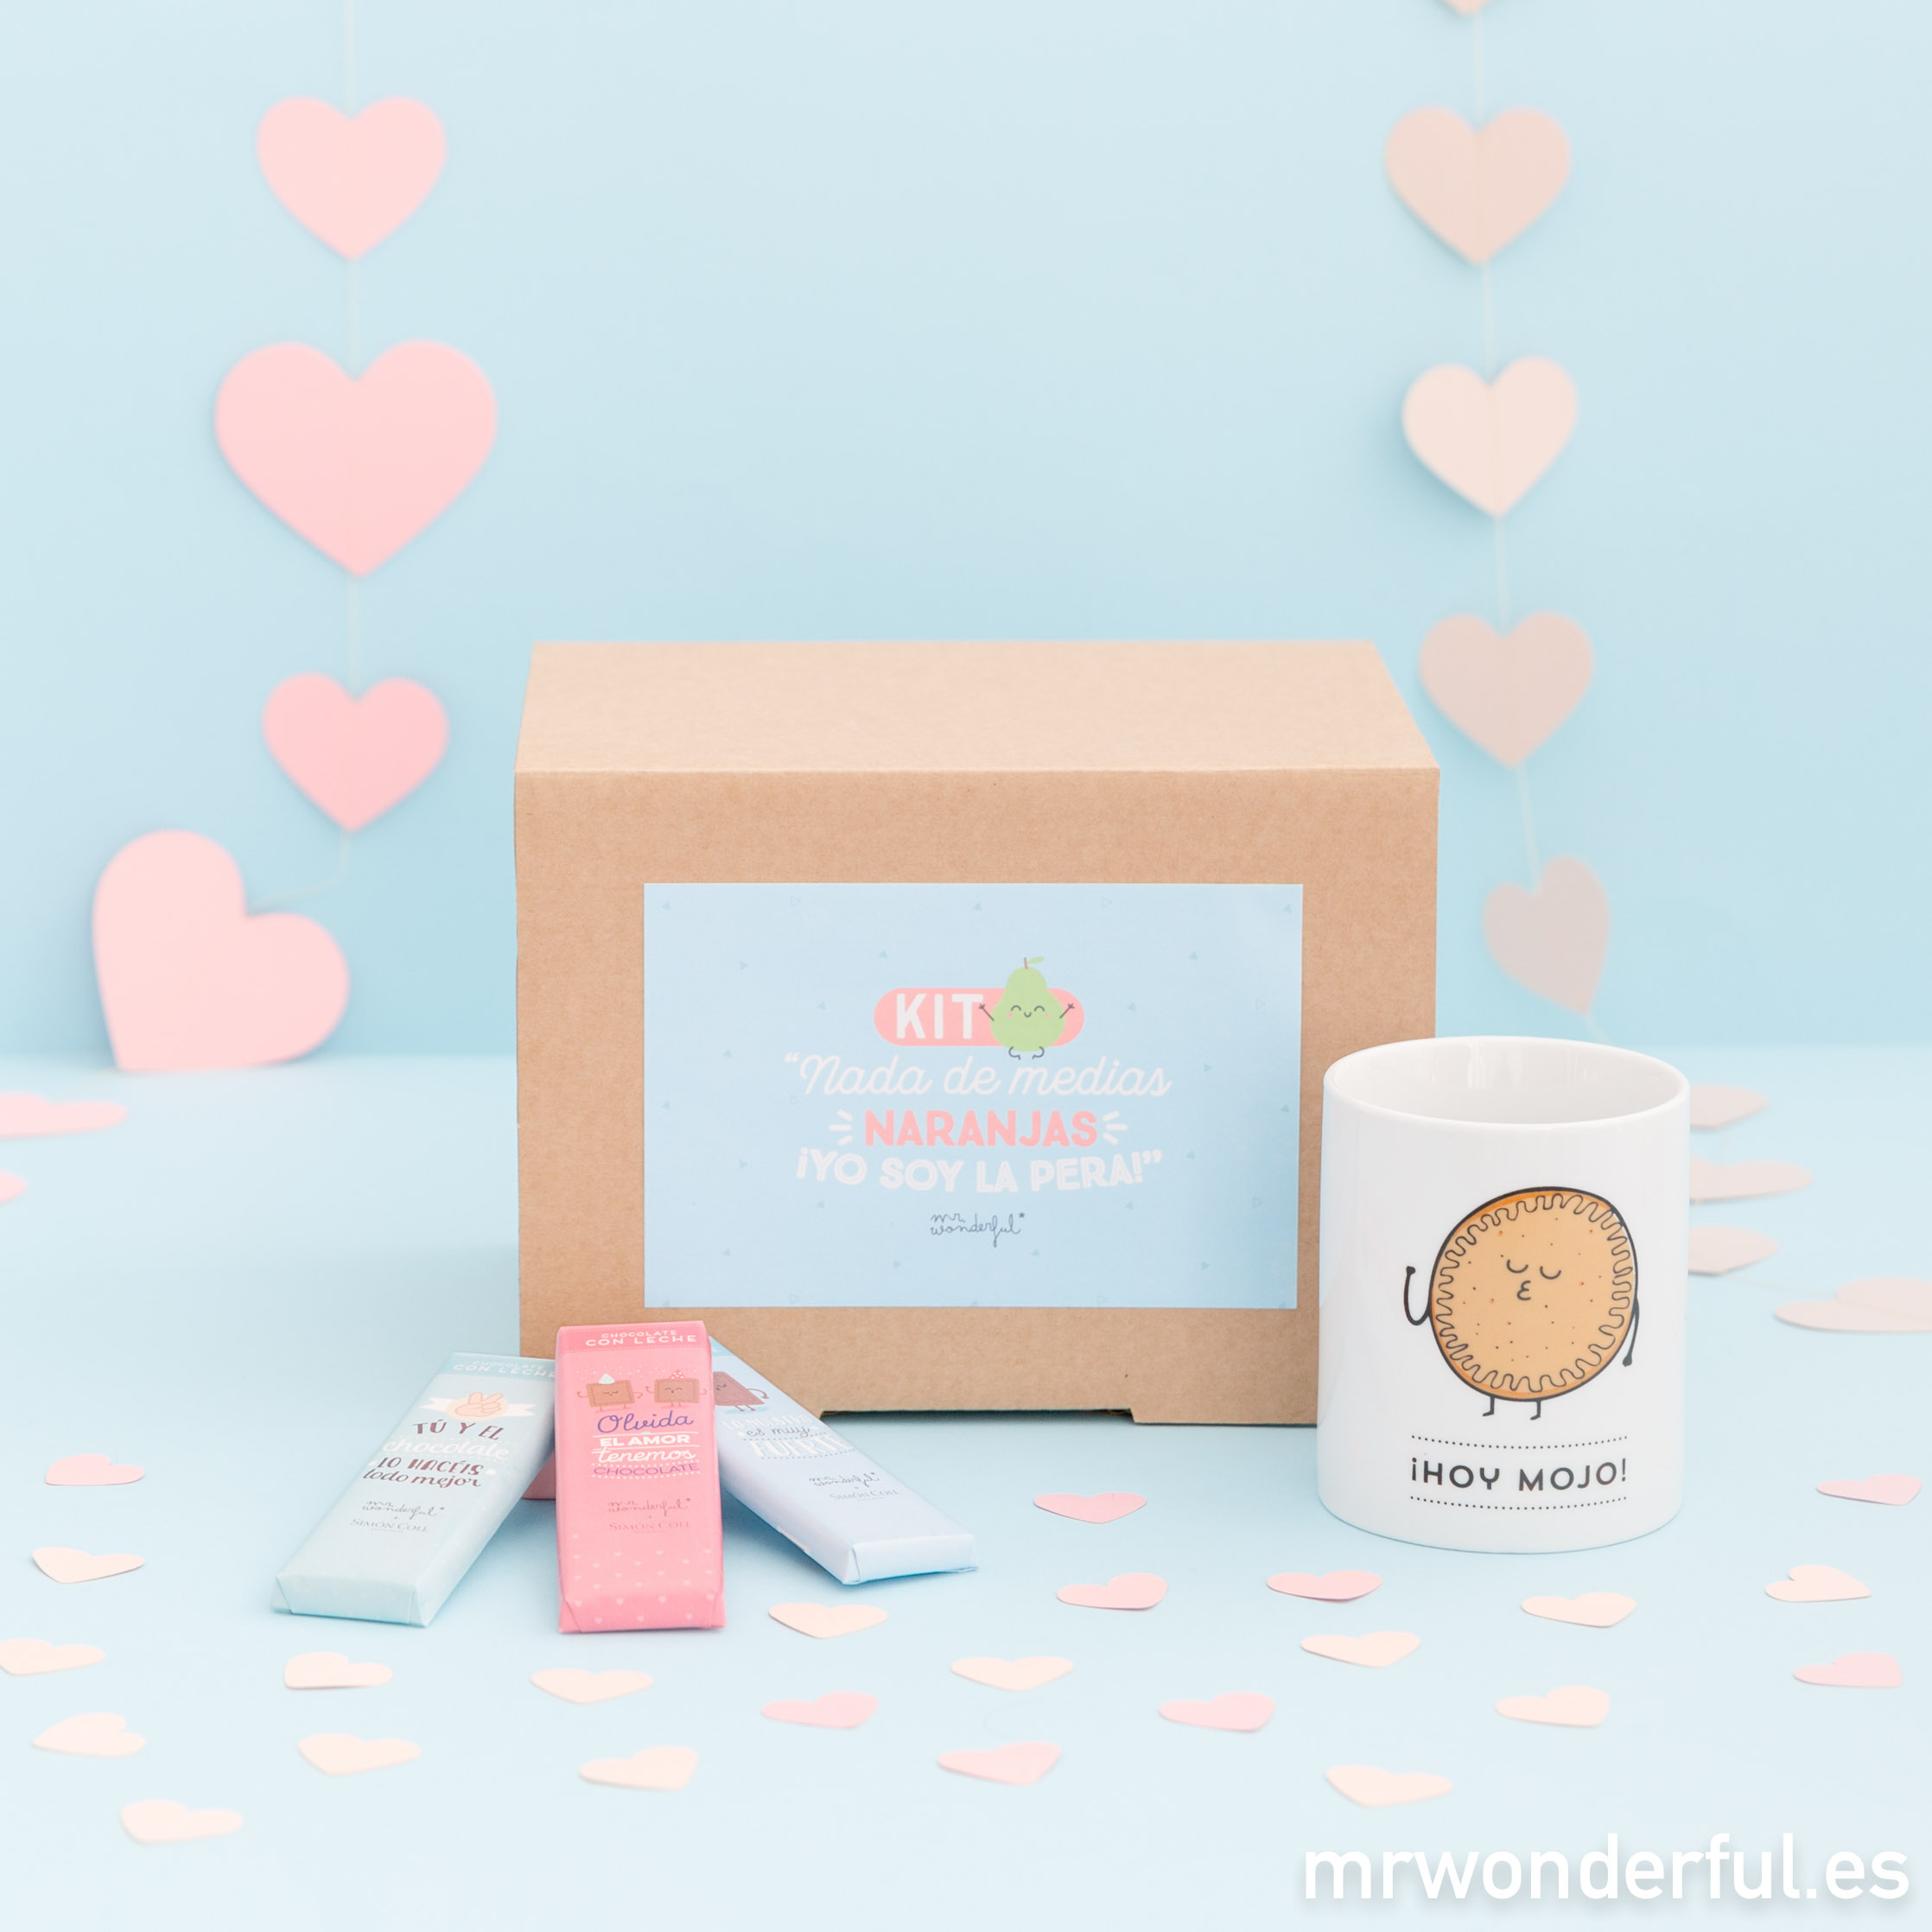 mrwonderful_kits-san-valentin-2017-67-editar